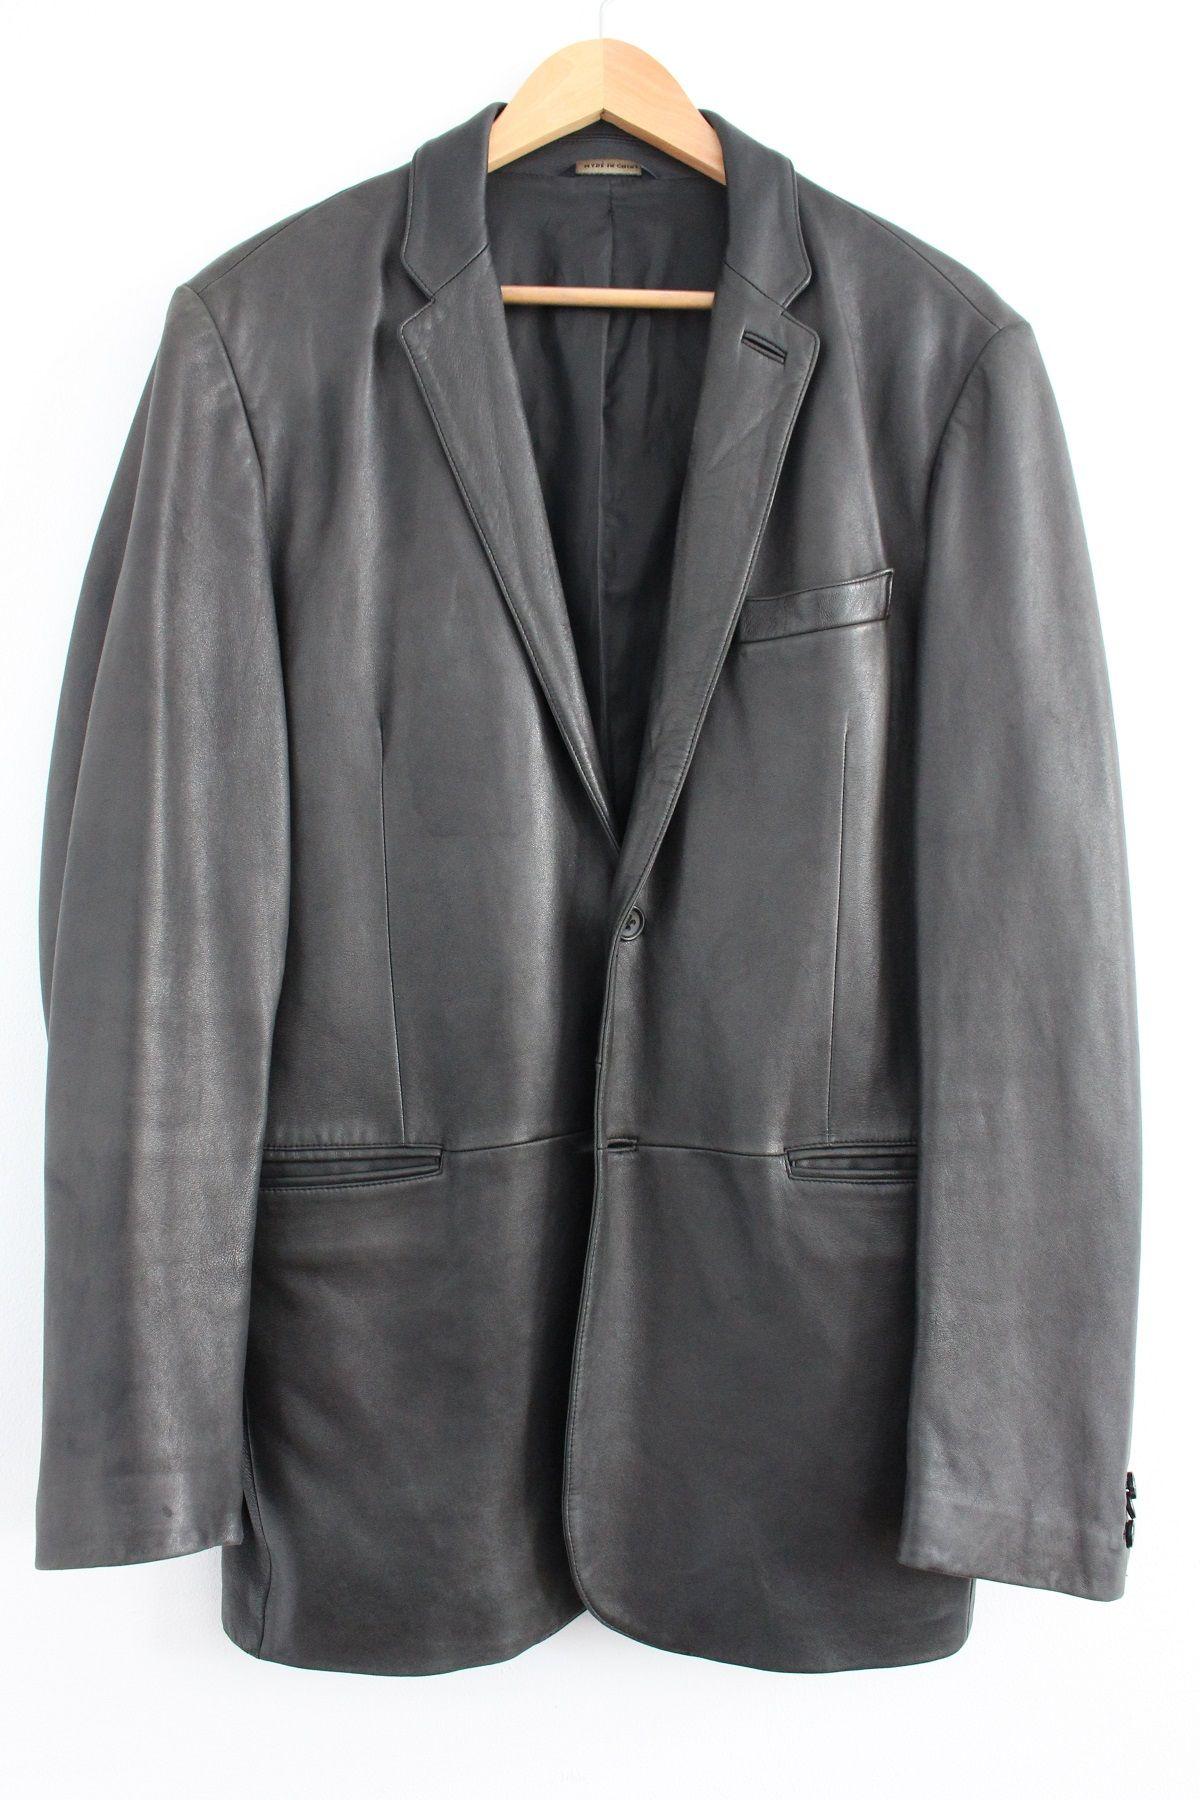 Banana Republic Genuine Leather Men's Jacket Mens